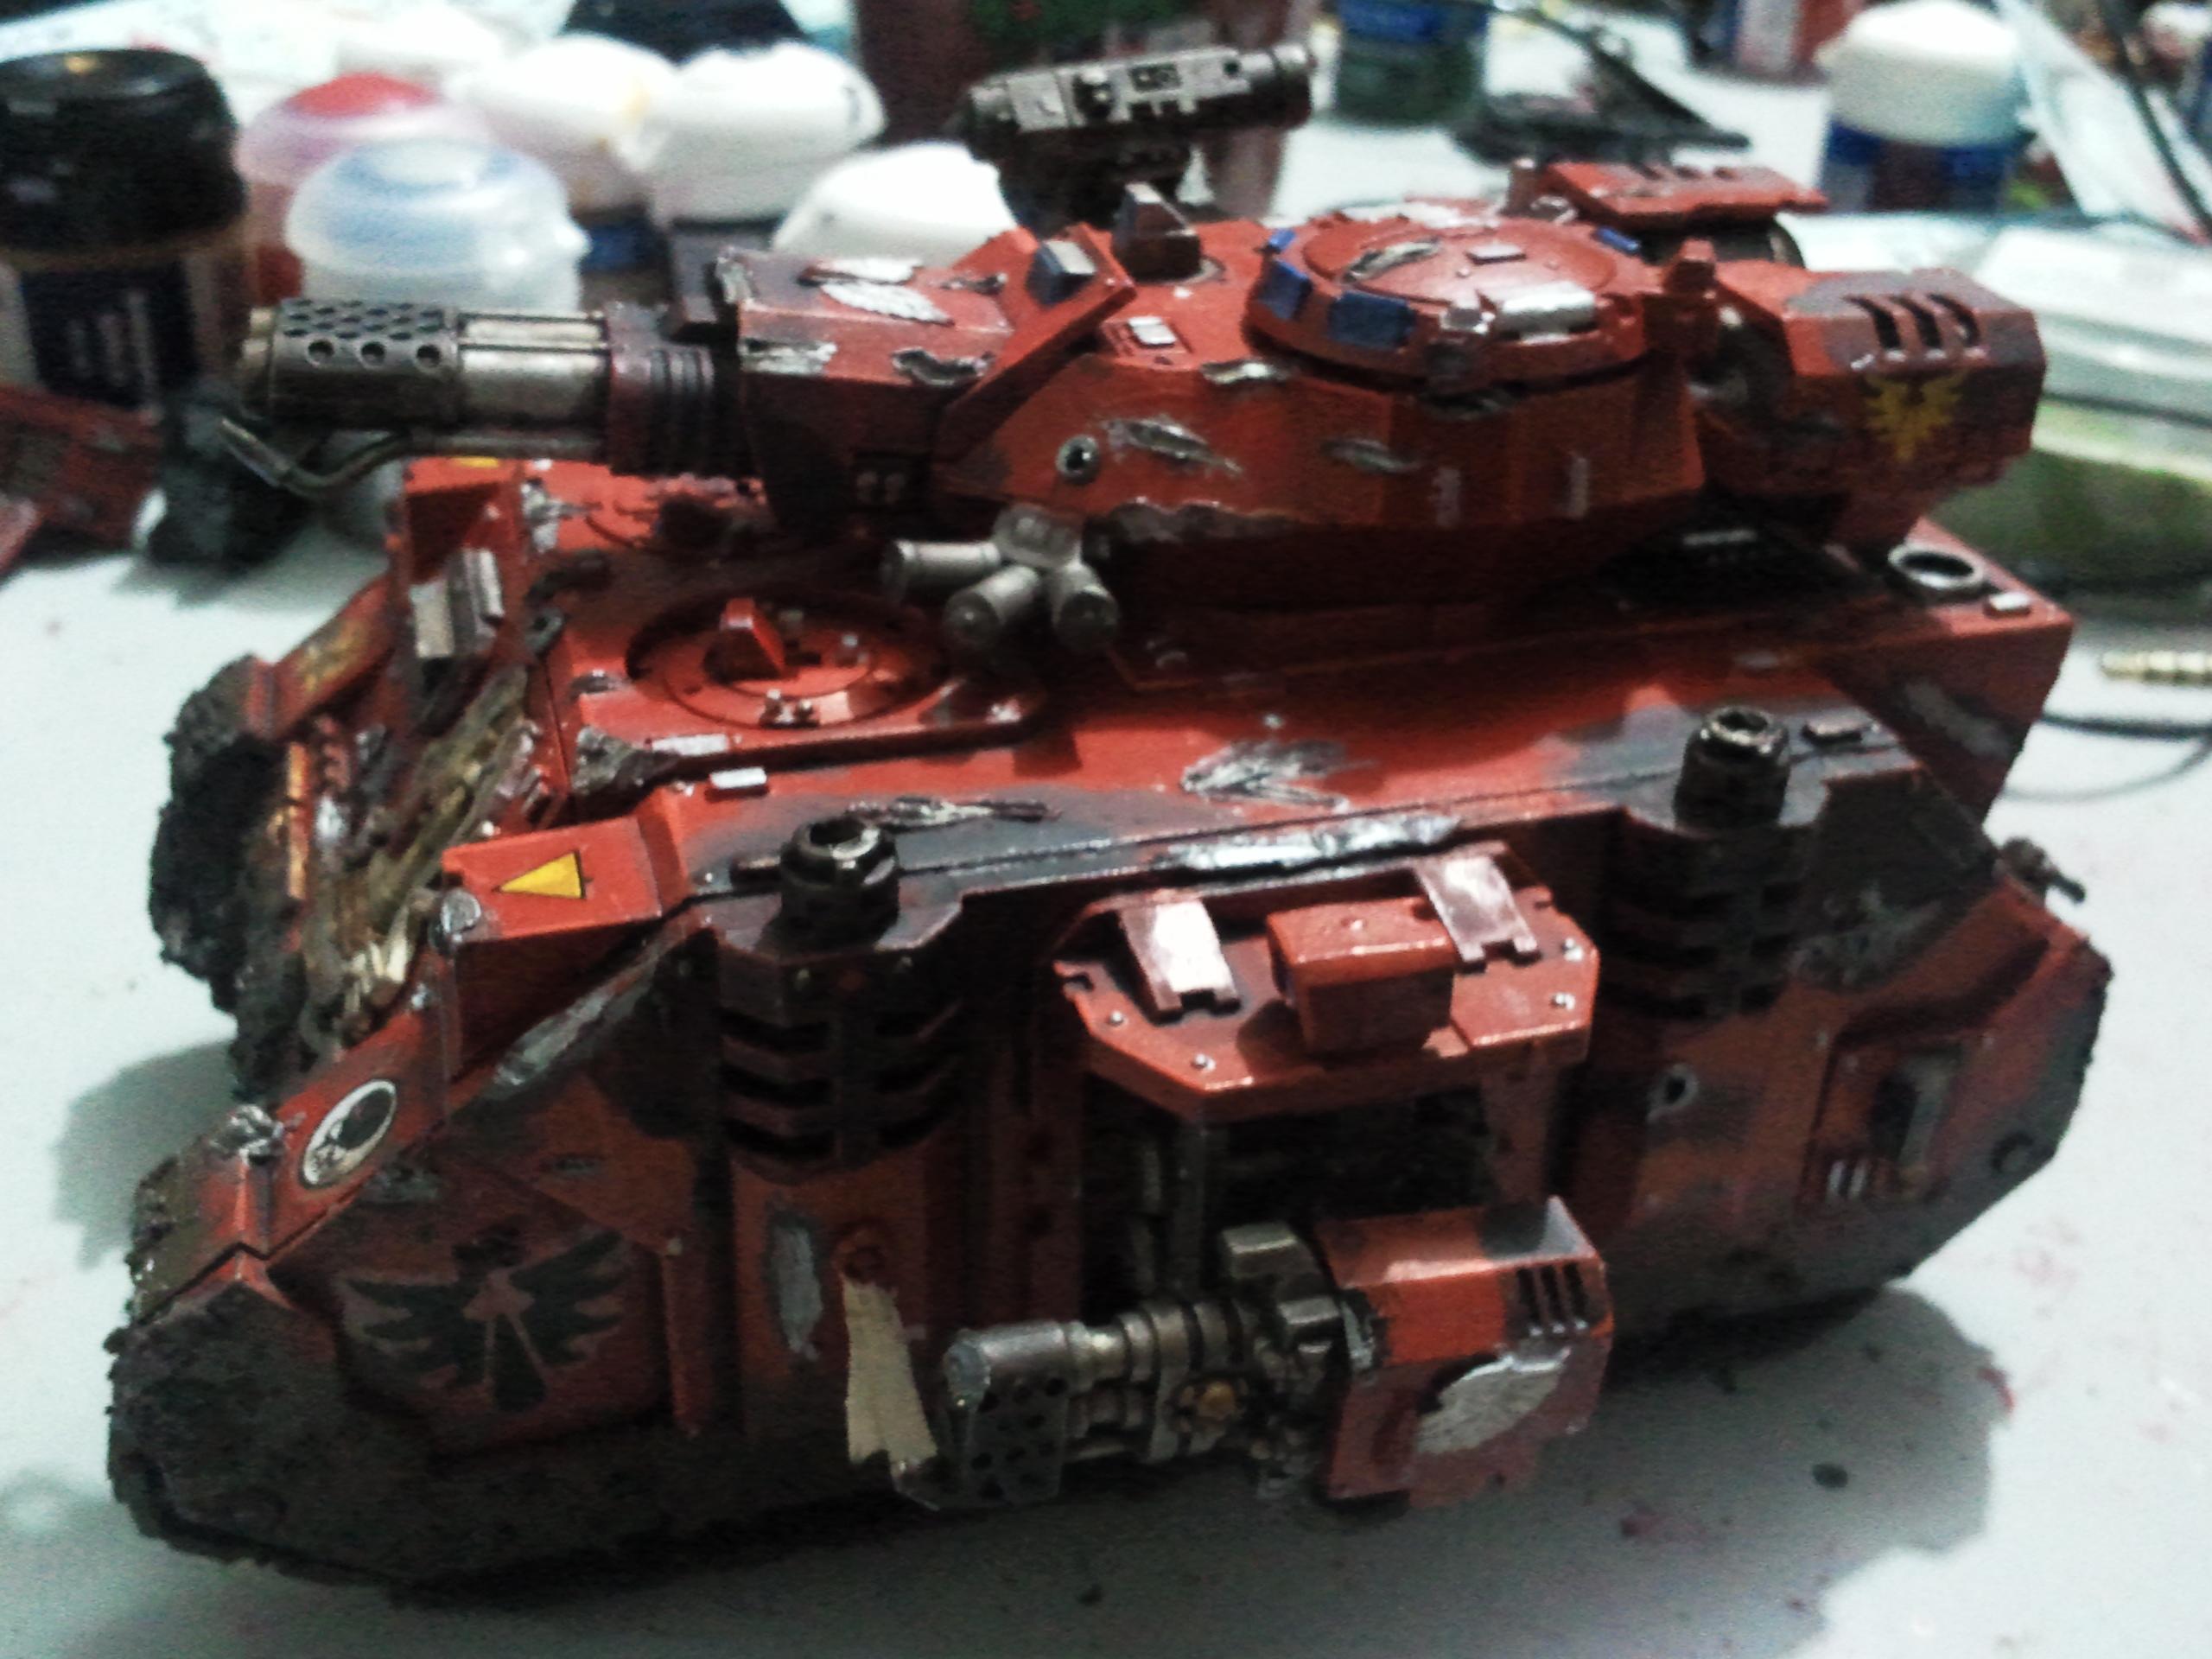 Baal Predator, Blood Angels, LED, Tank, Warhammer 40,000